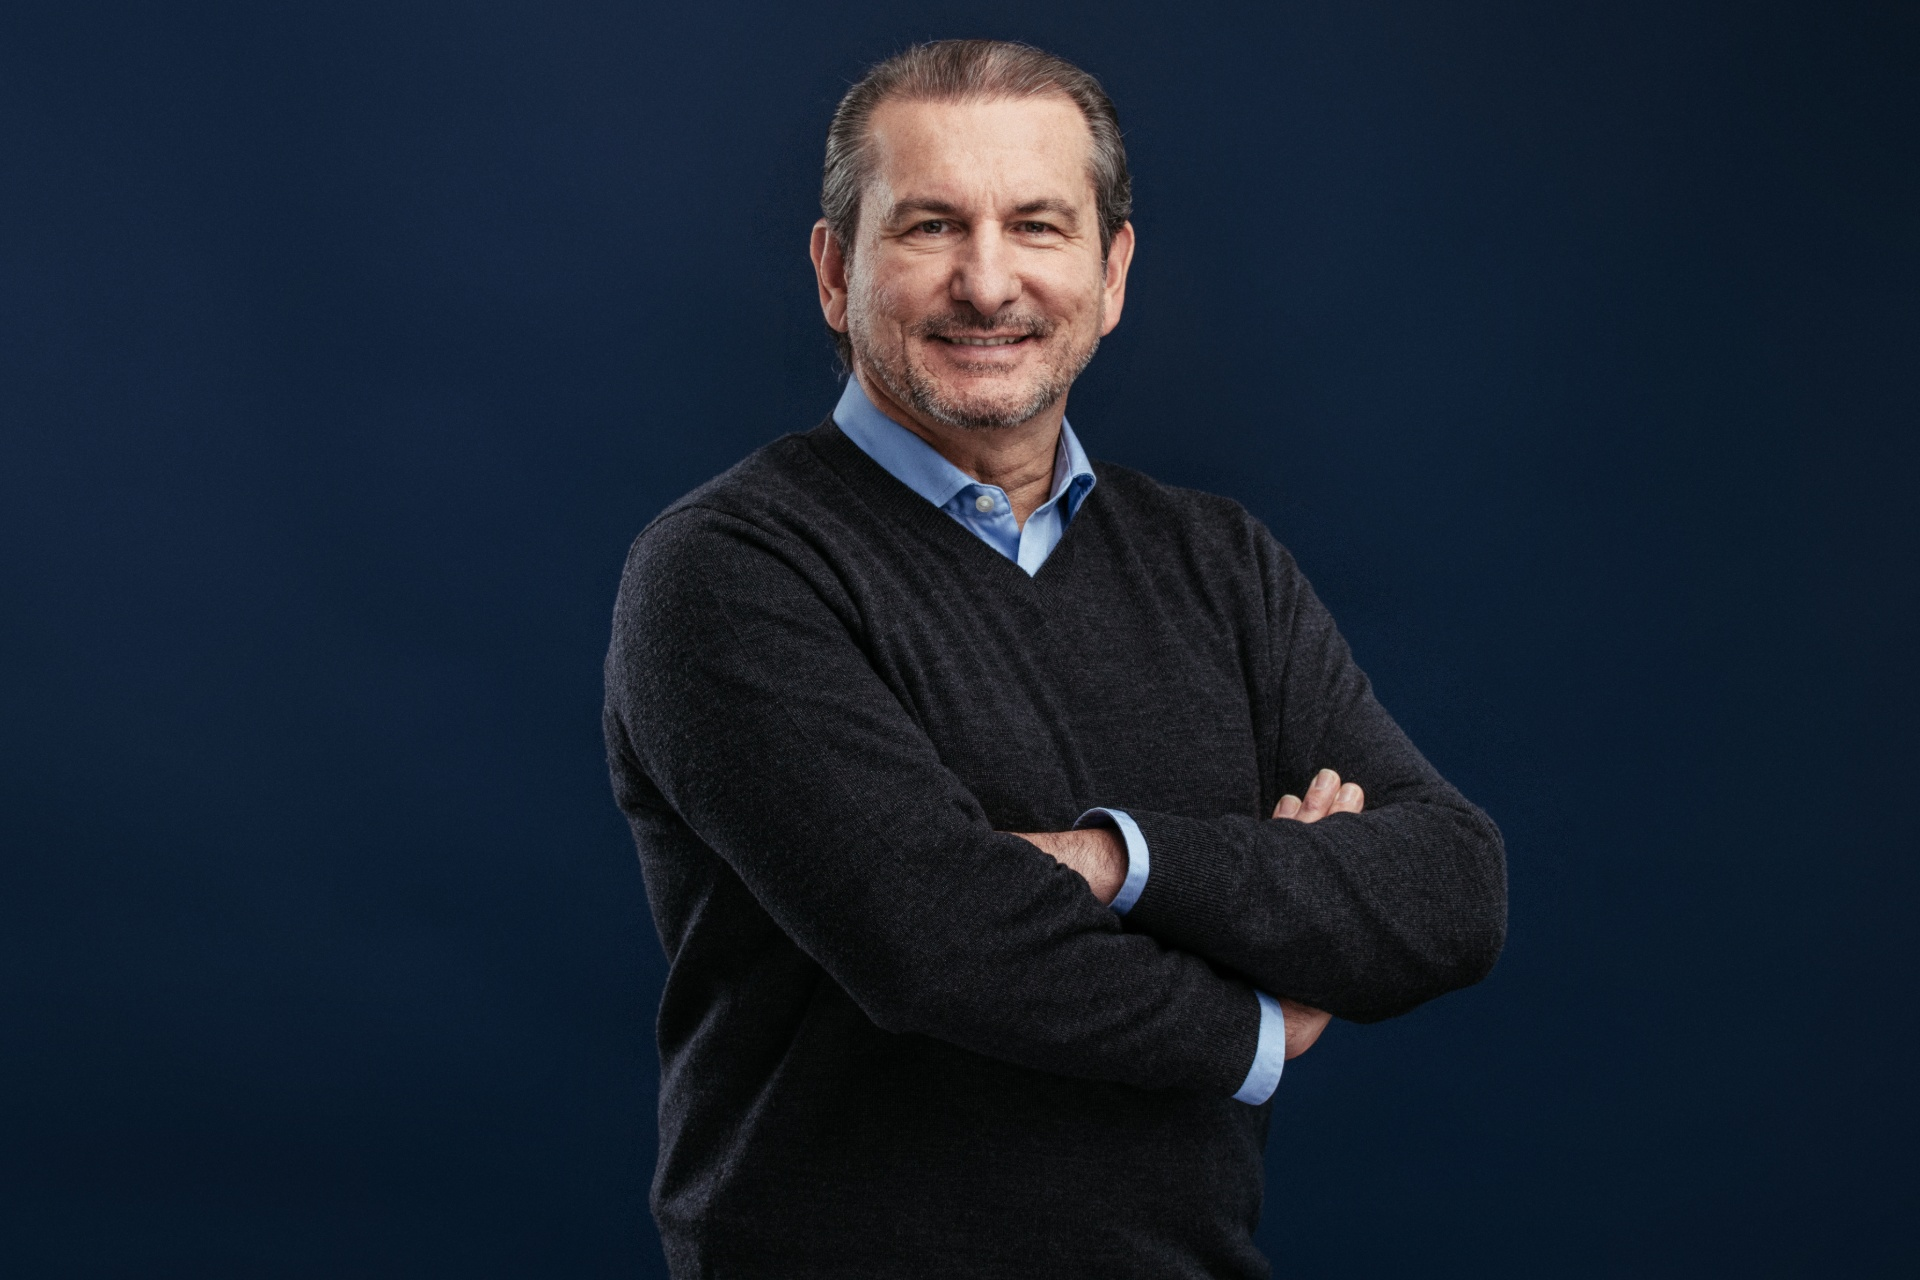 Solarisbank CEO Dr. Roland Folz ©Max Threlfall Photo.jpg